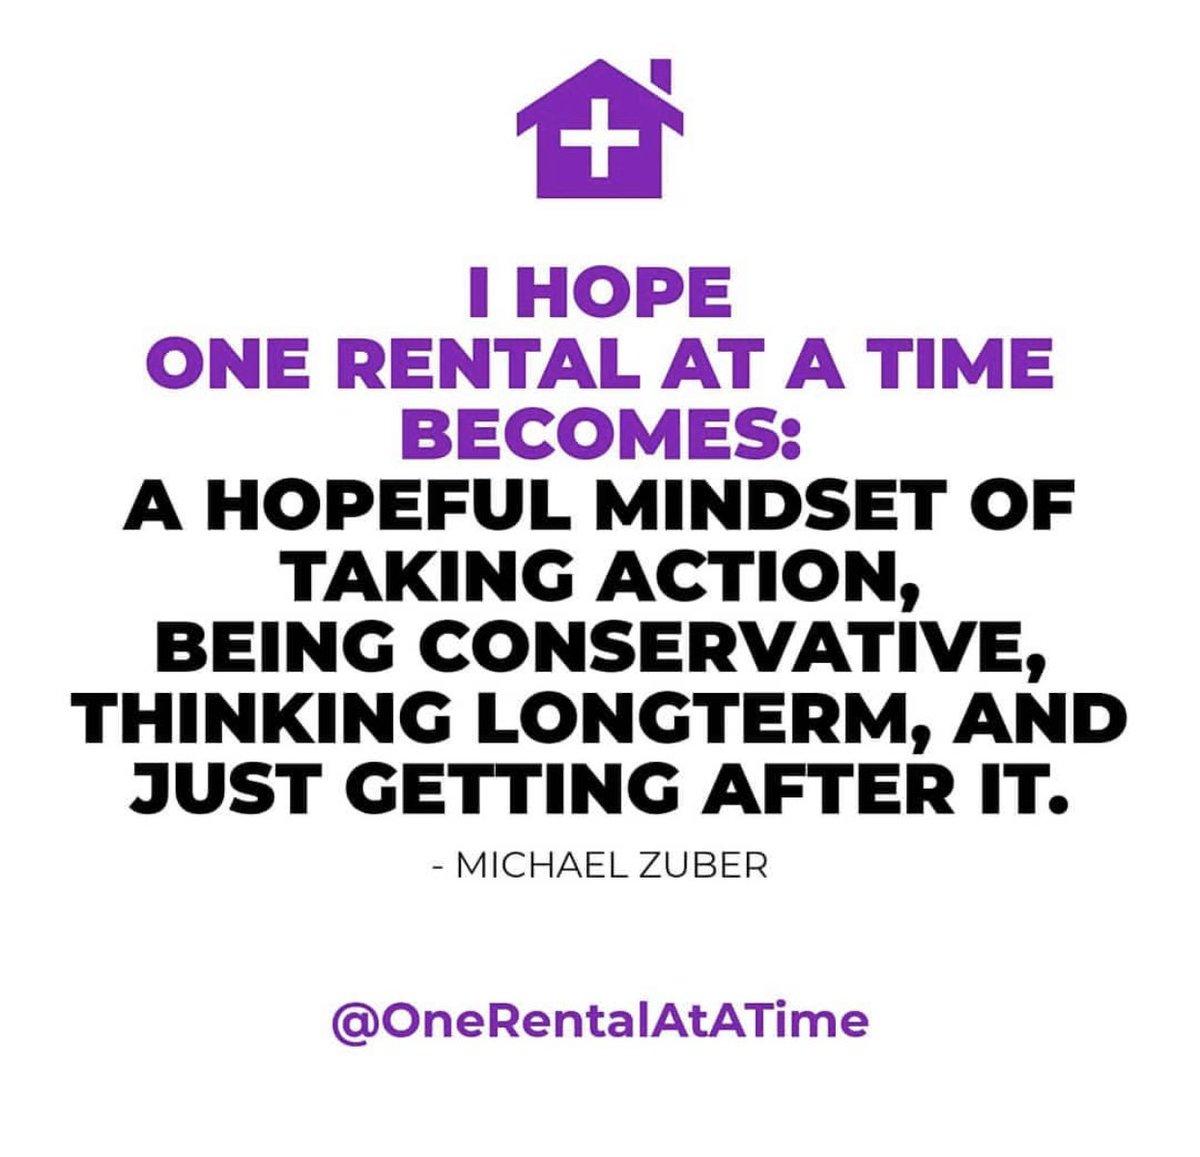 Simply love this message and I hope you do too #Fresno #onerentalatatime #investingpic.twitter.com/OEOxCTfuwO